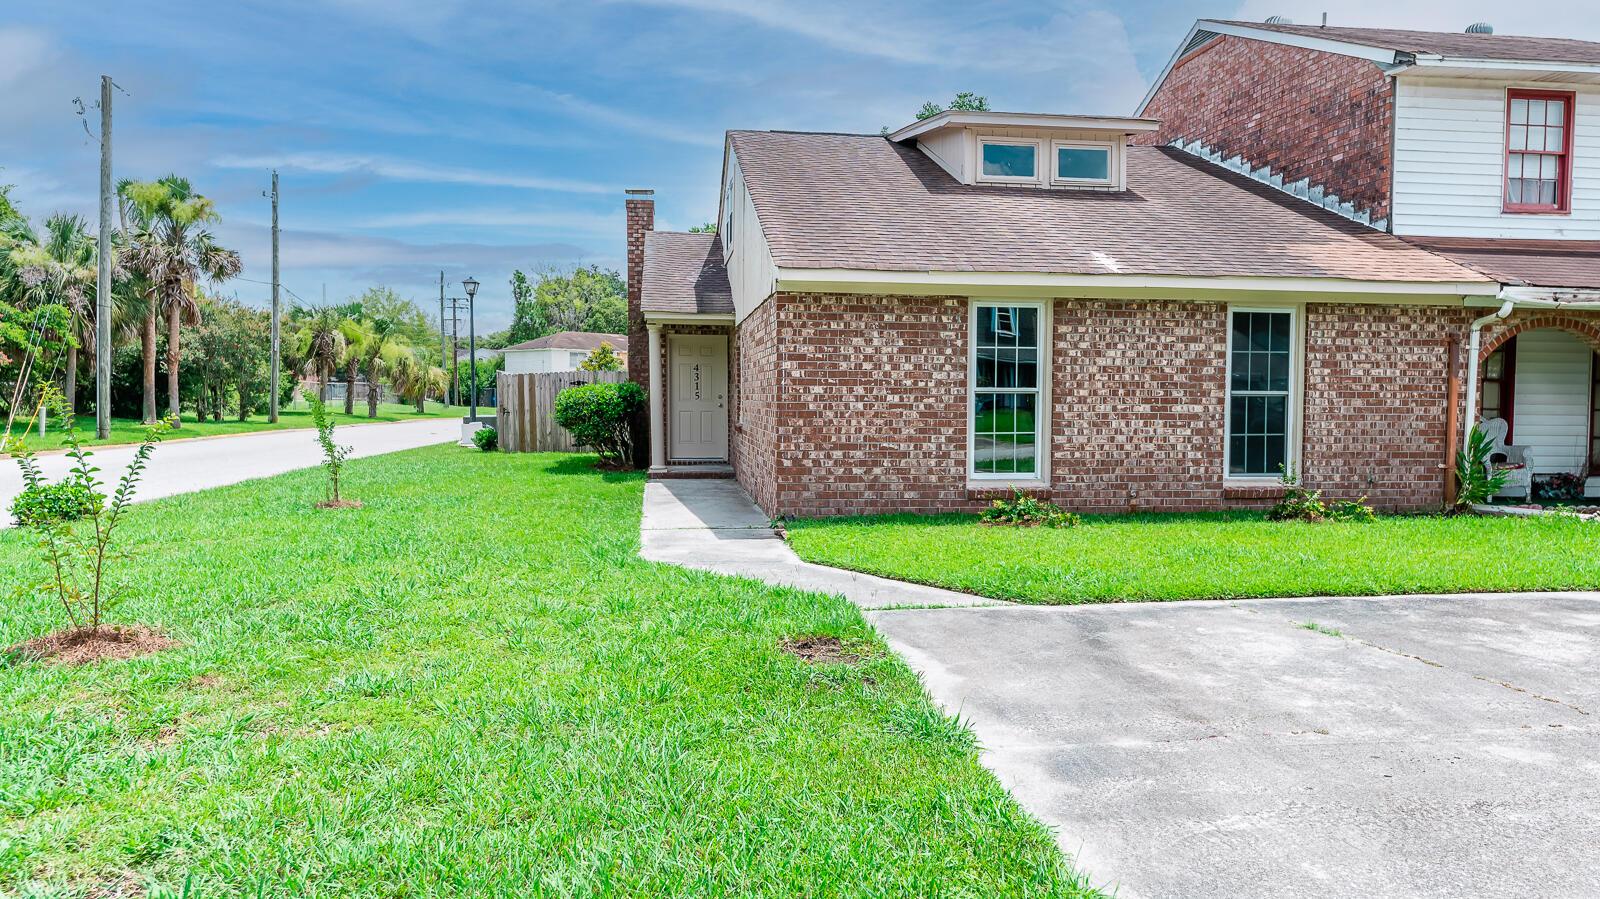 Ashley Villas Homes For Sale - 4315 Briarstone, North Charleston, SC - 32